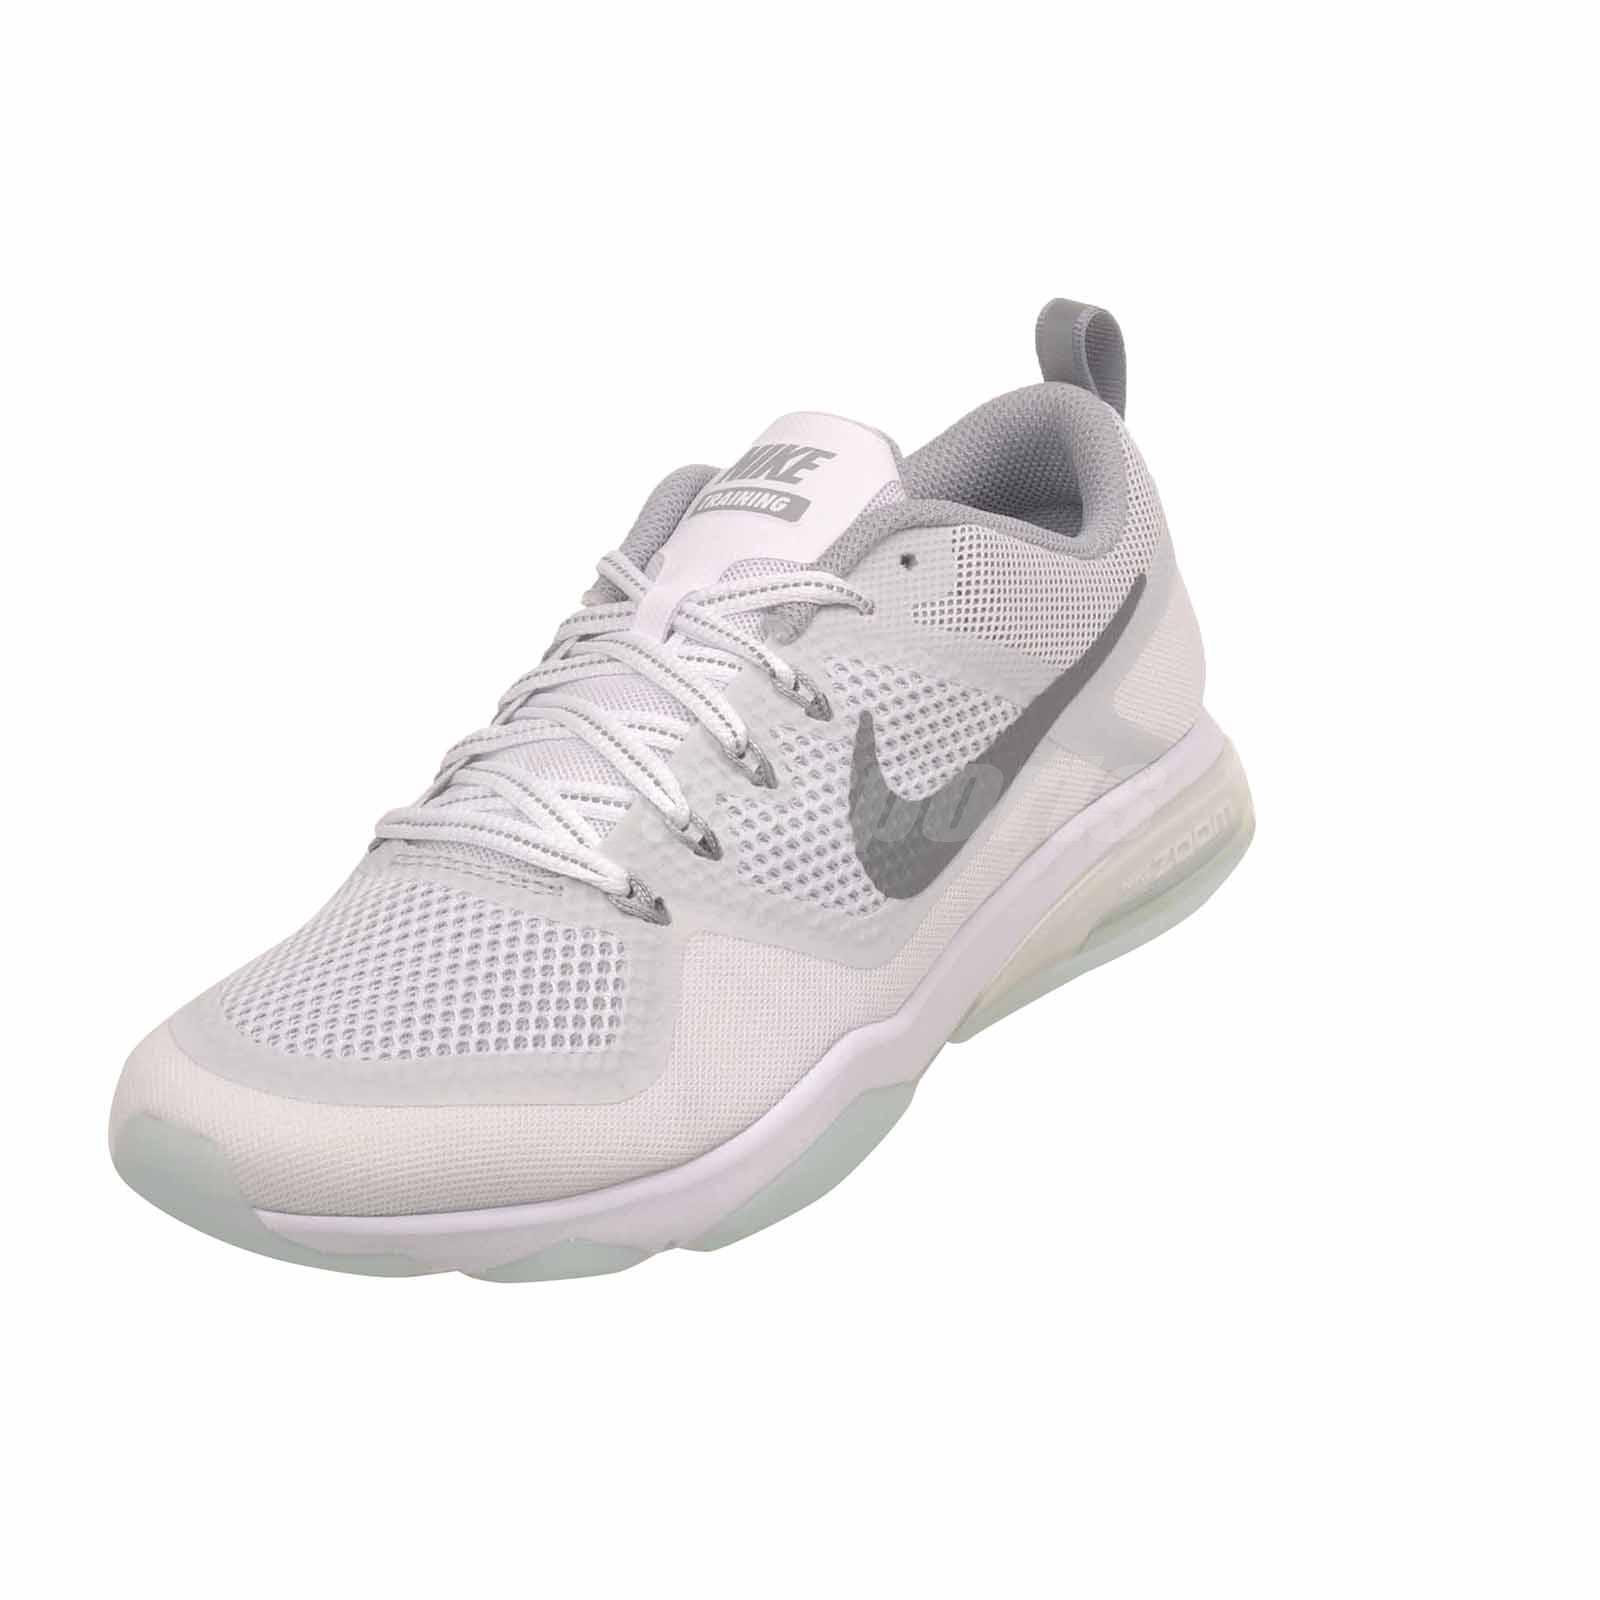 92b93b0605638 Nike Air Zoom Fitness Reflect Cross Training Womens Shoes White ...